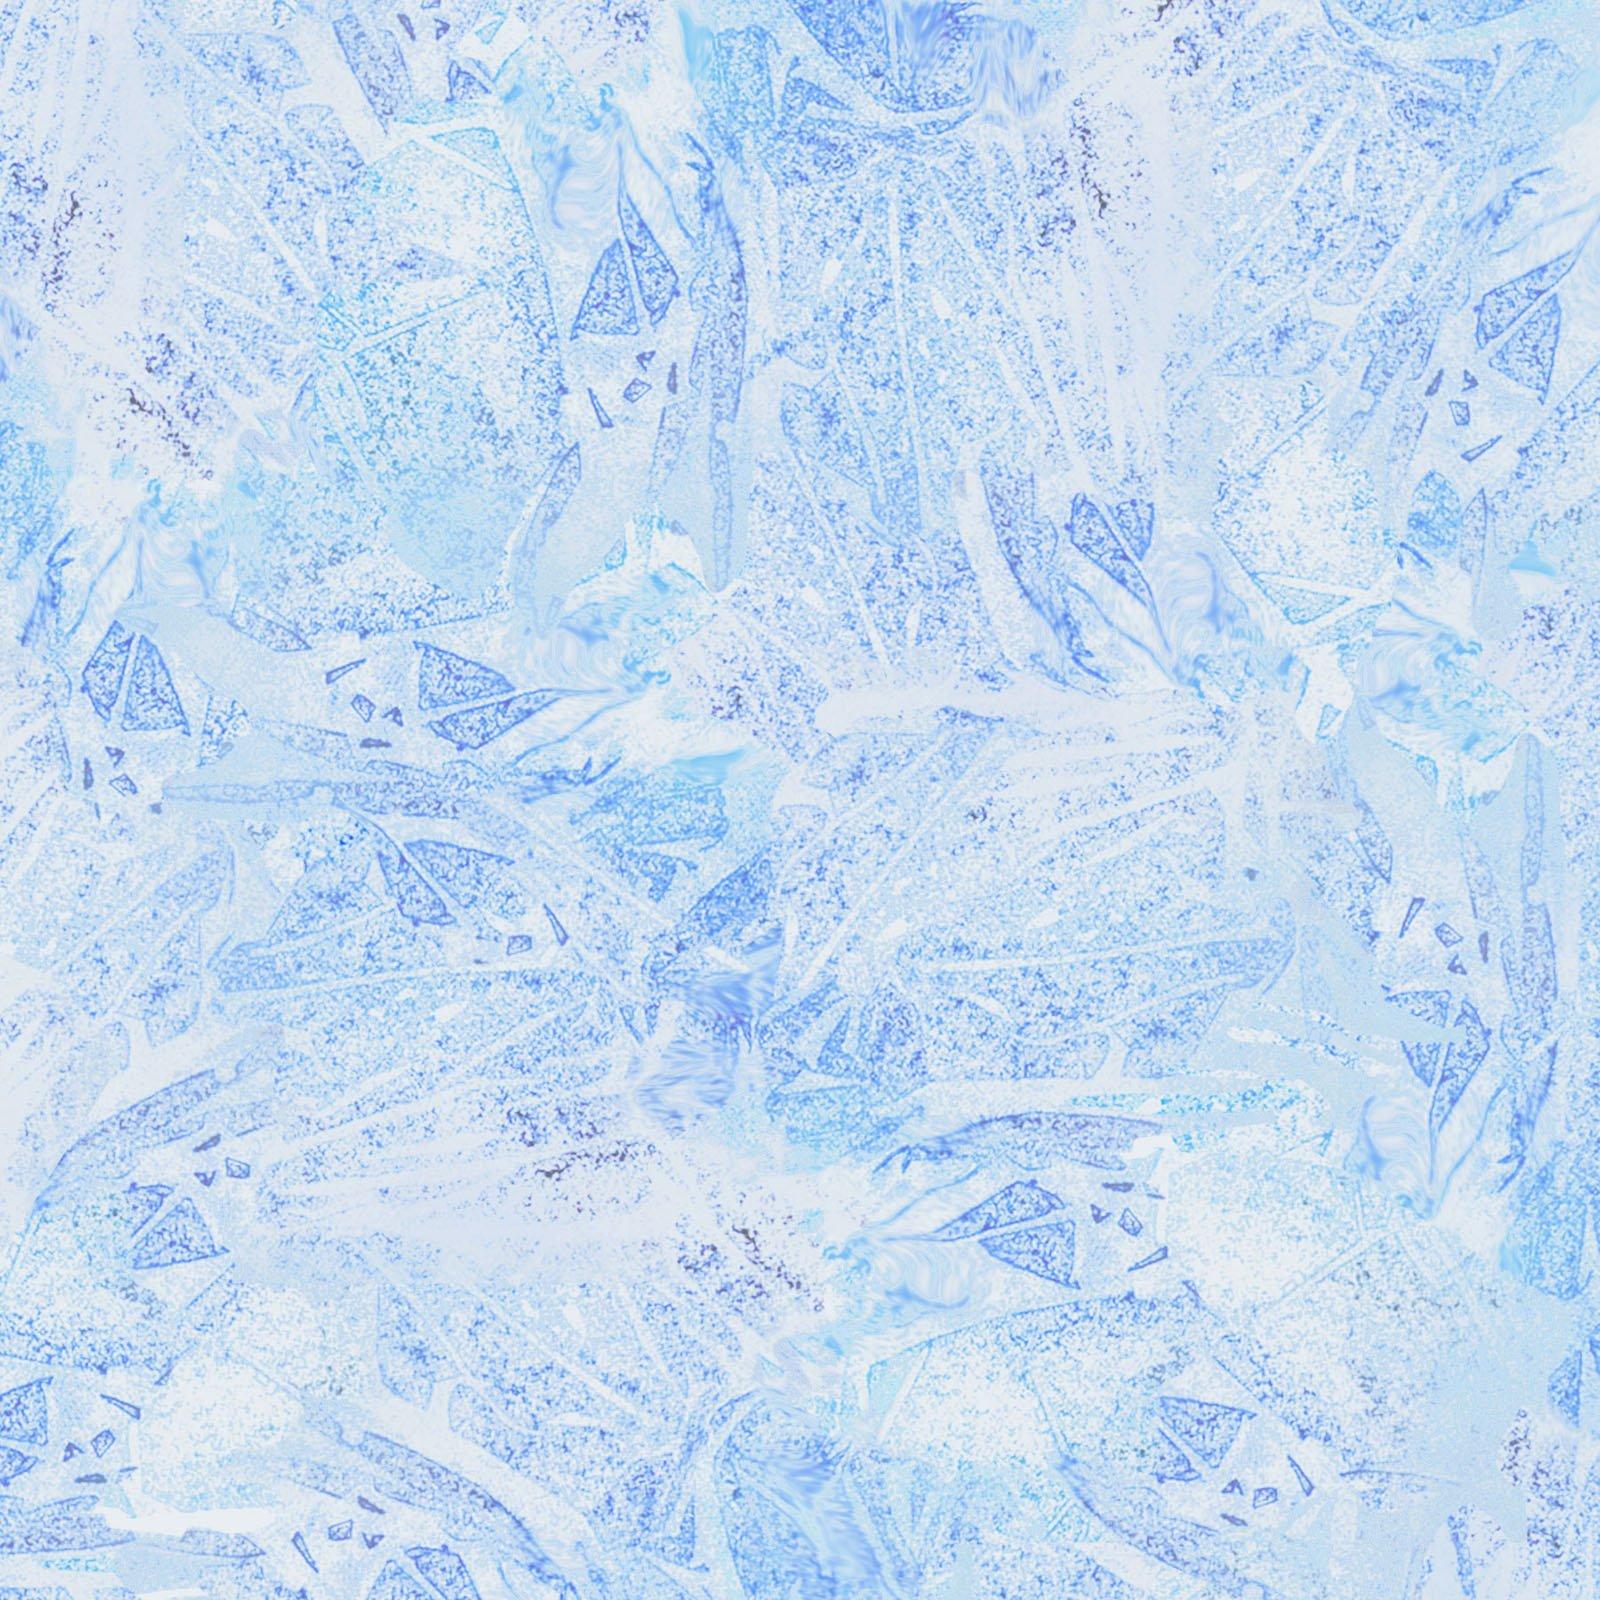 FRAC-4123 LB - FRACTURE BY TERESA ASCONE LT BLUE